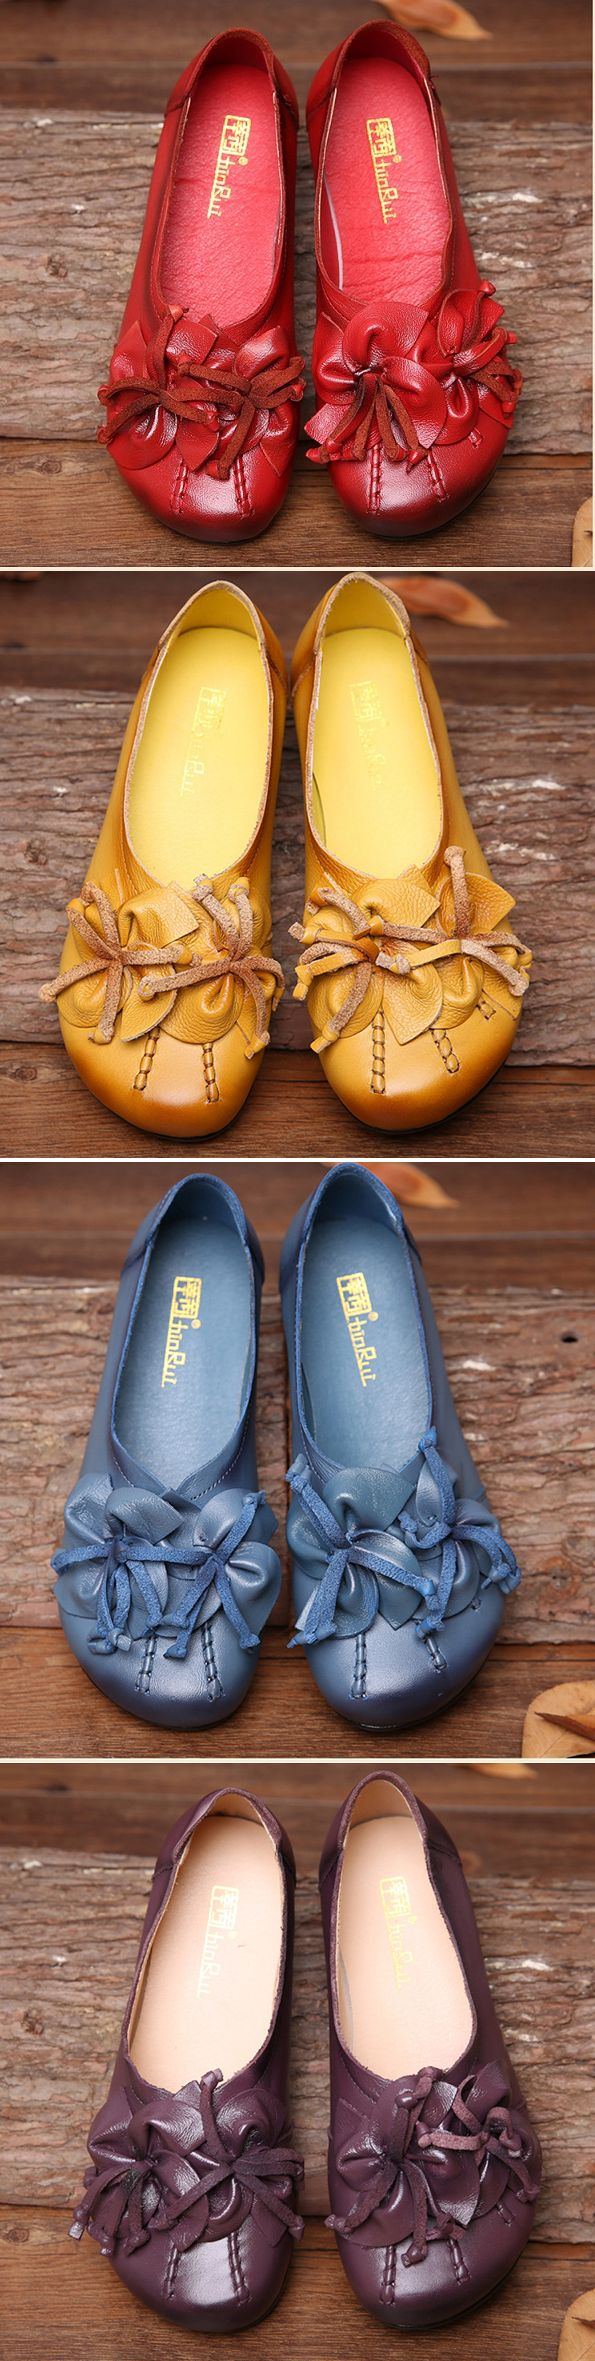 US$26.57 Socofy Flower Tassel Soft Leather Slip On Flat Casual Vintage Shoes